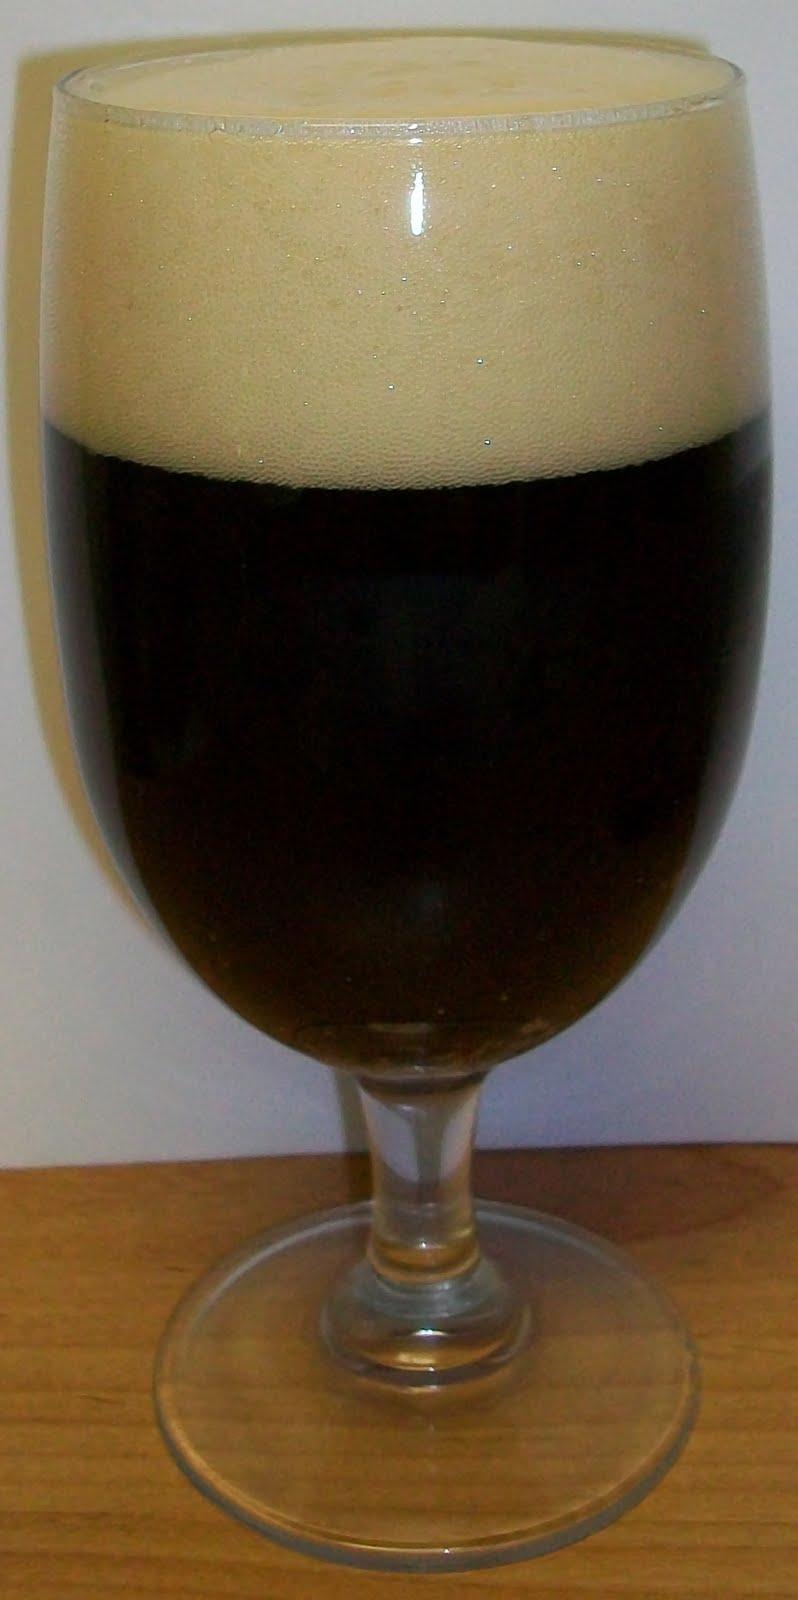 John's Bier Blog: Boxcar Brown Ale